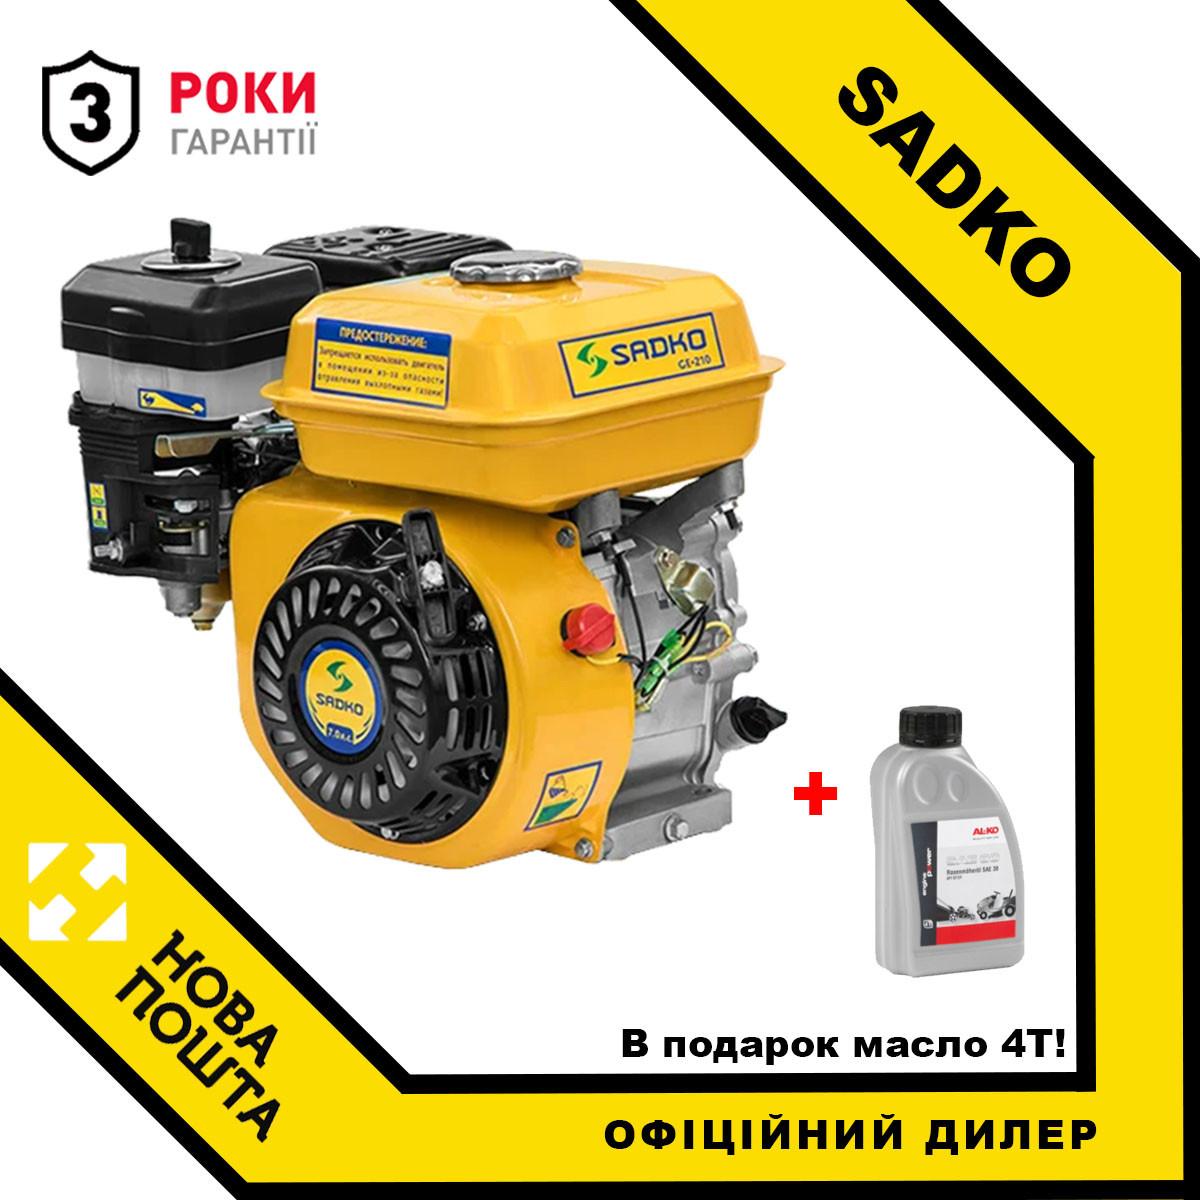 Двигун бензиновий Sadko GE-440 + в подарок масло 4Т!